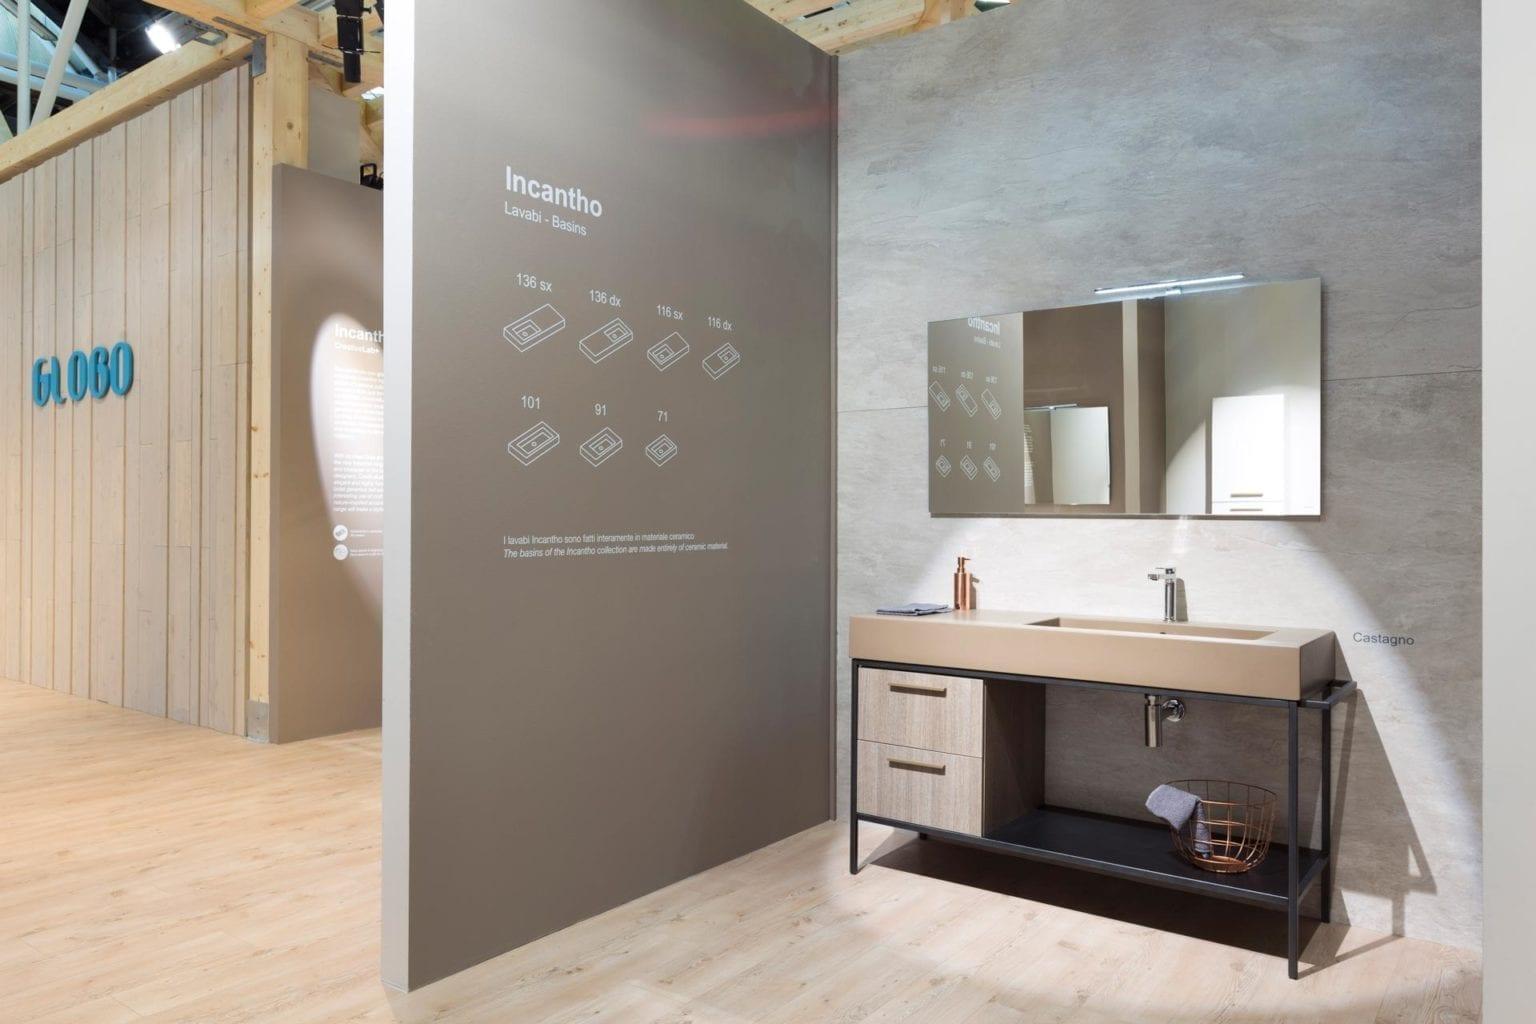 Globo Cersaie 2015 exhibition interior design 03